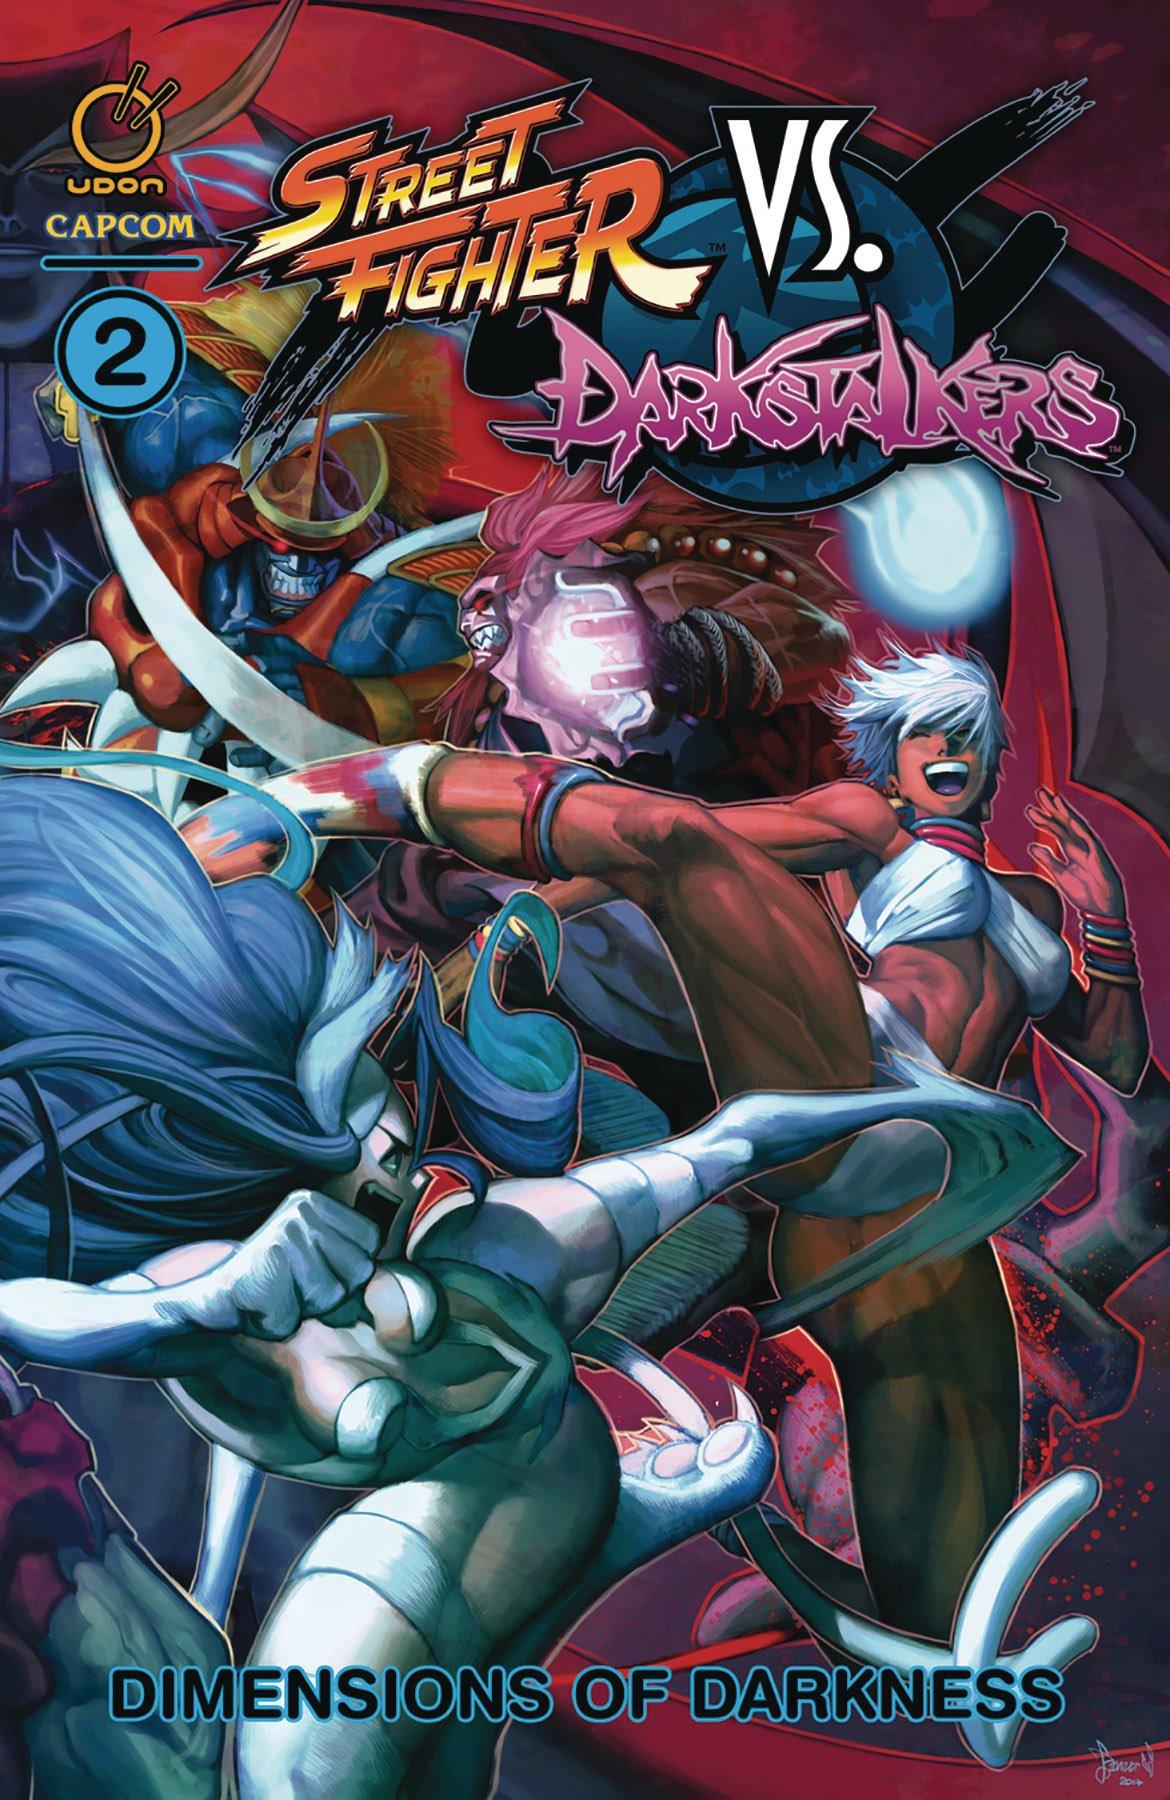 Street Fighter VS Darkstalkers TPB 2 - Dimensions of Darkness